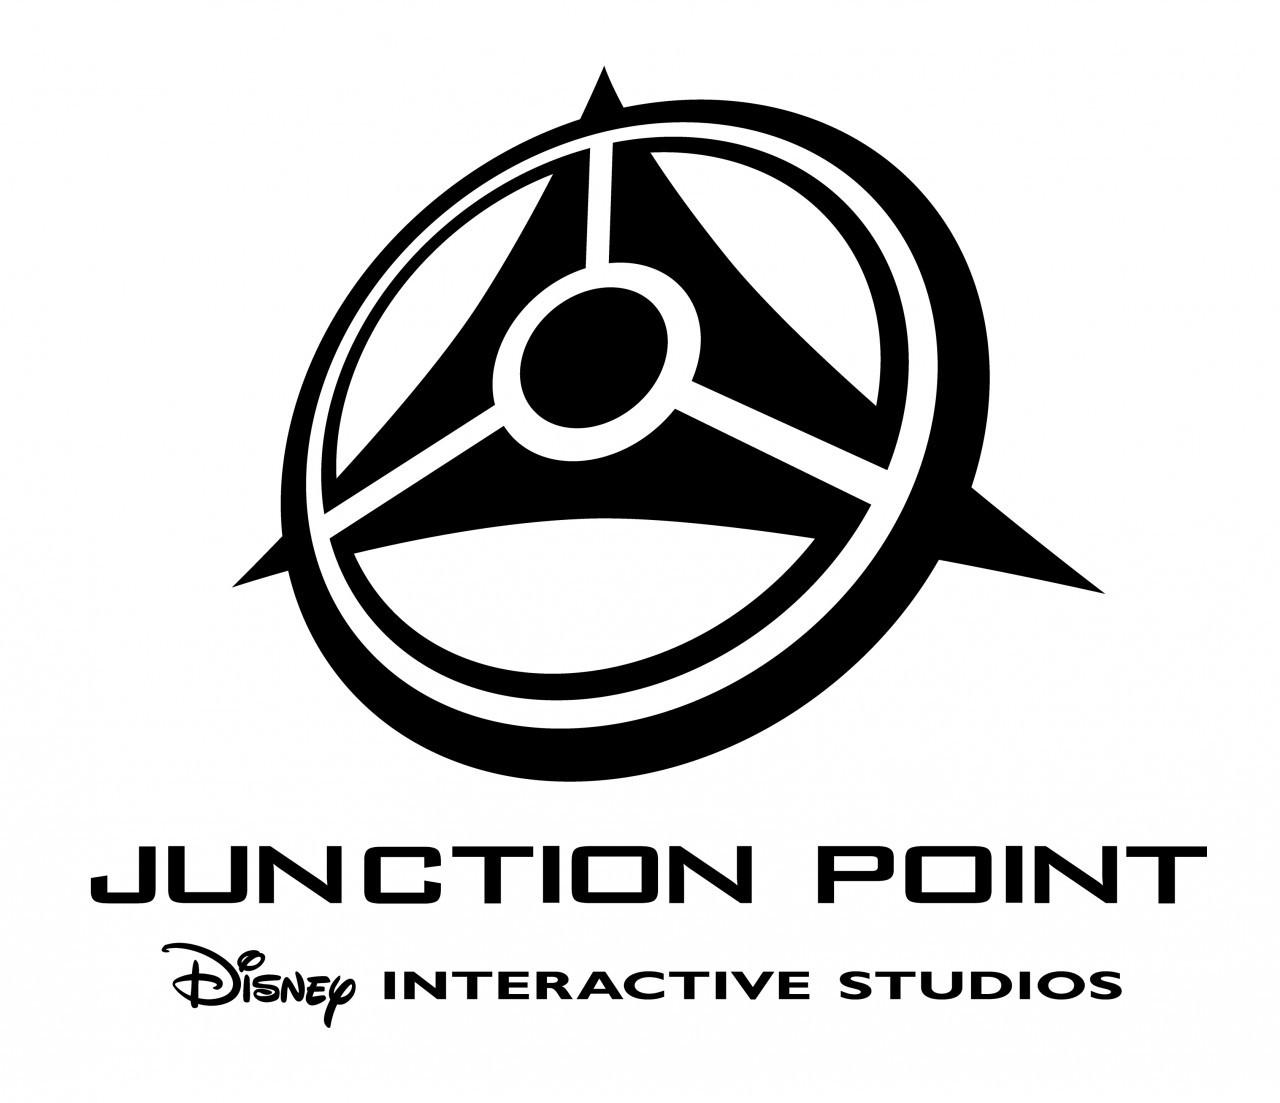 Artworks Junction Point